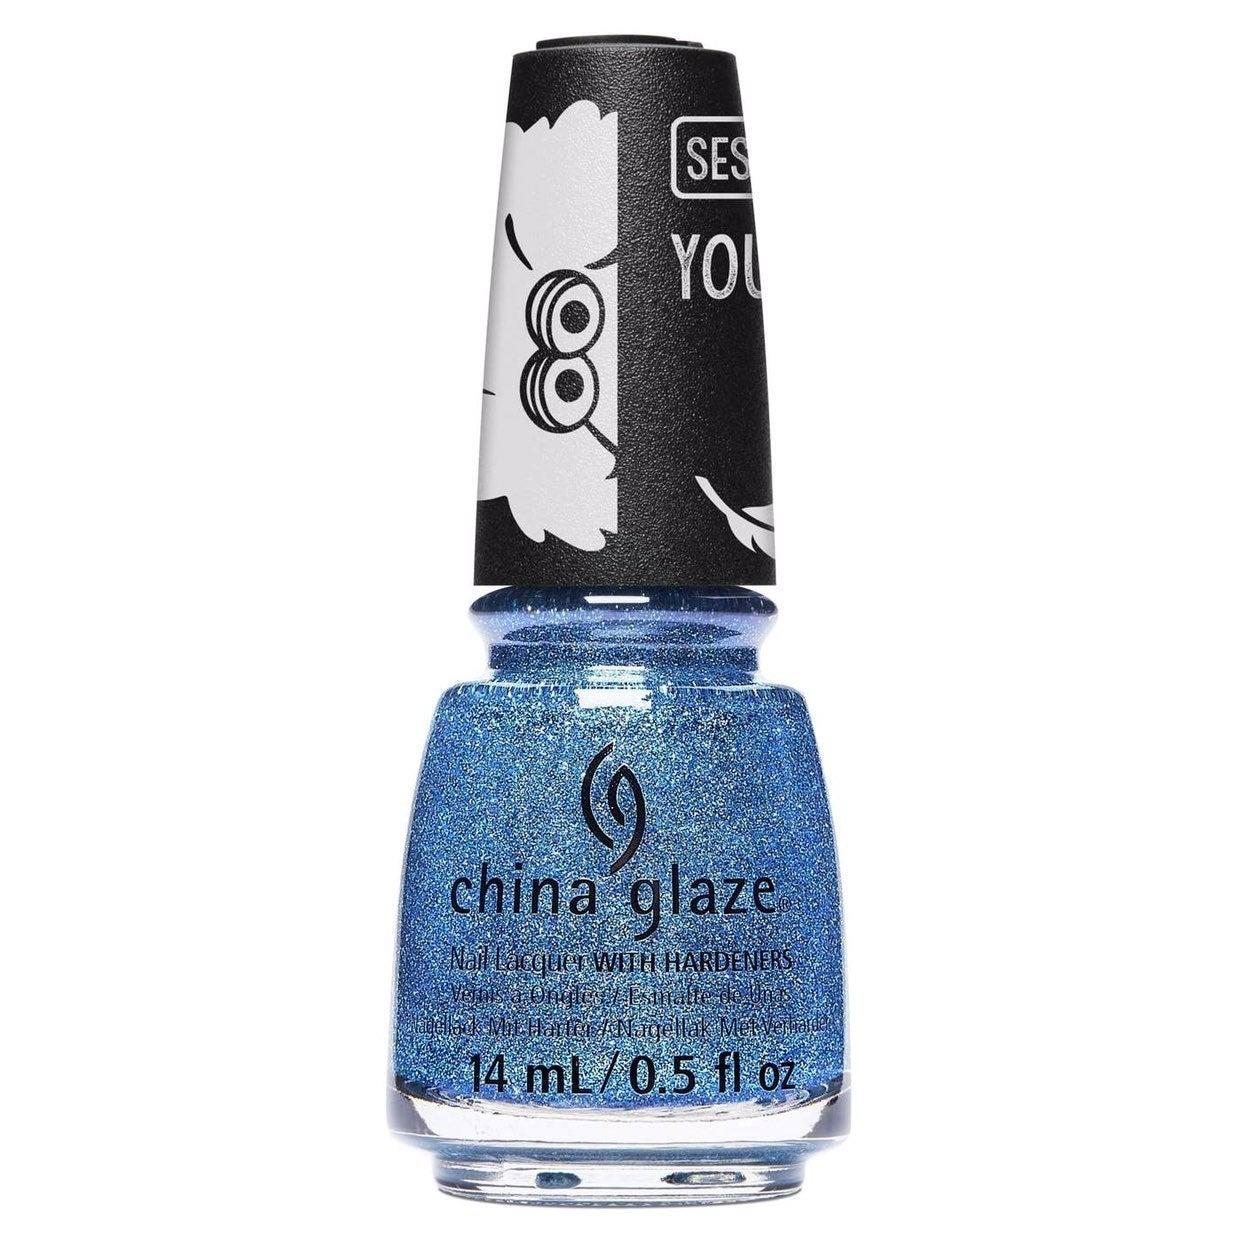 China Glaze x Sesame Street Nail Polish